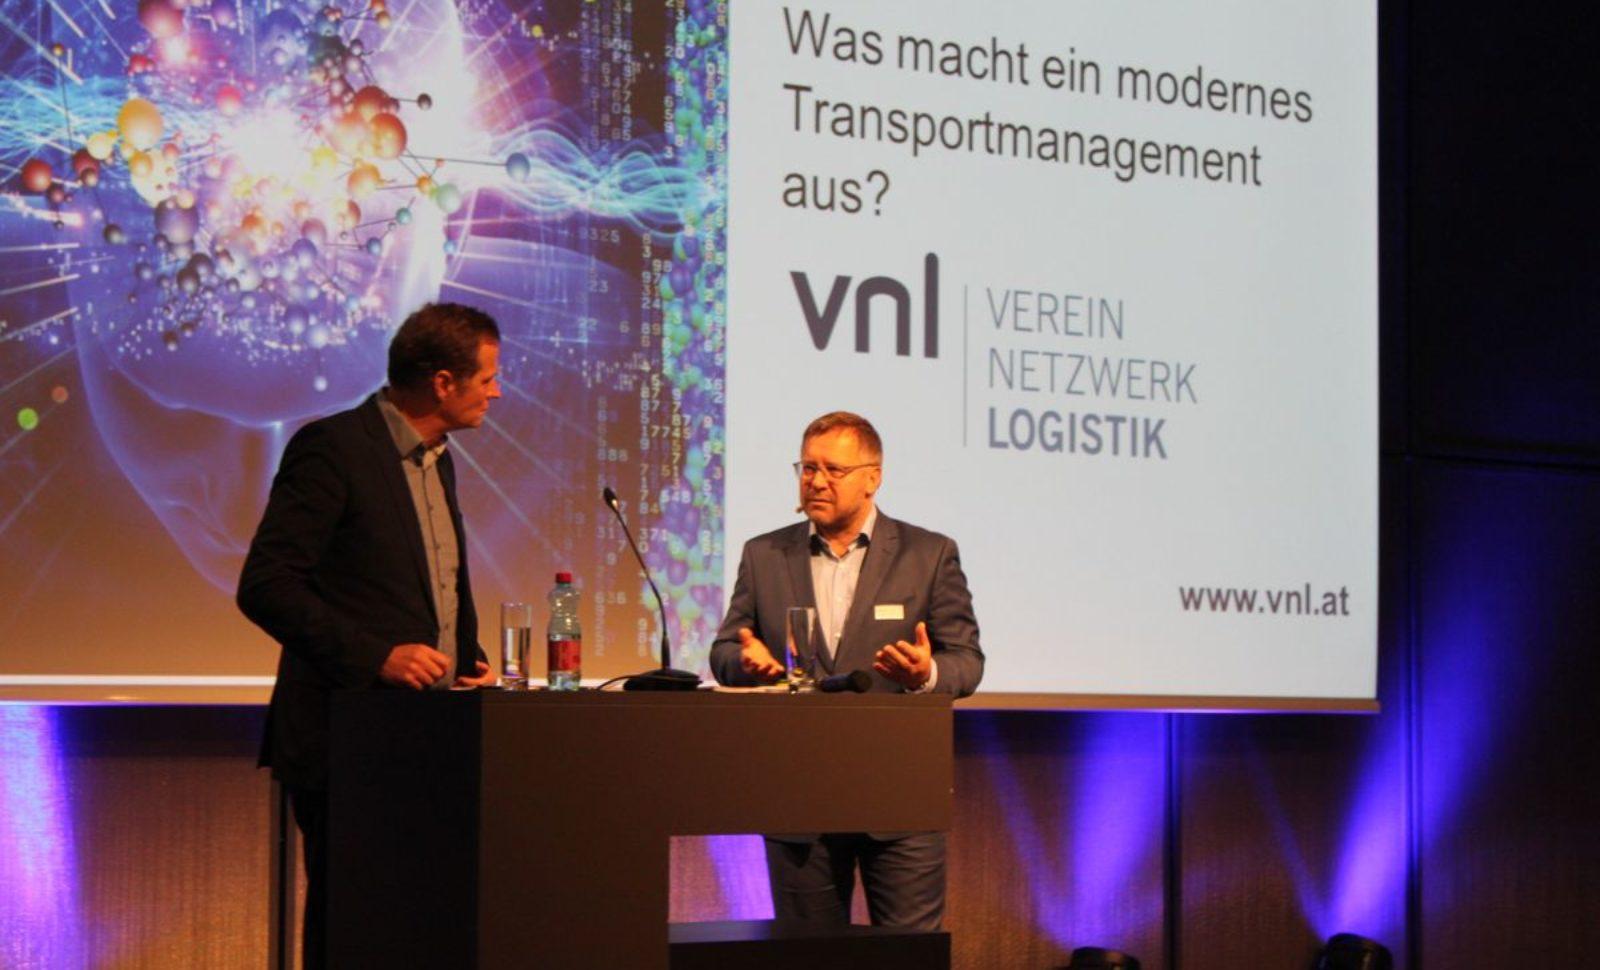 VNL-Powerday Transportmanagement, 21. November 2017, voestalpine Stahlwelt Linz